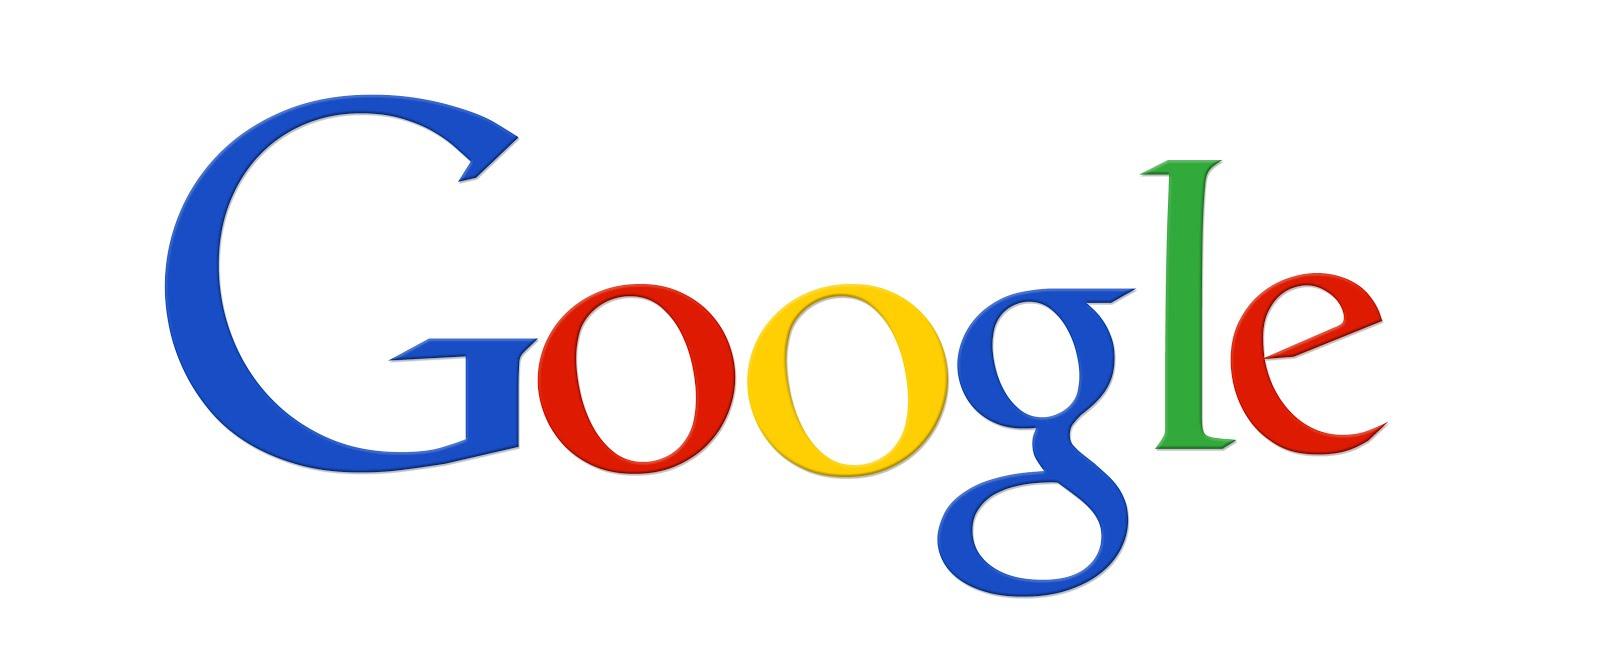 Relacionado en Google: hipócrita anson